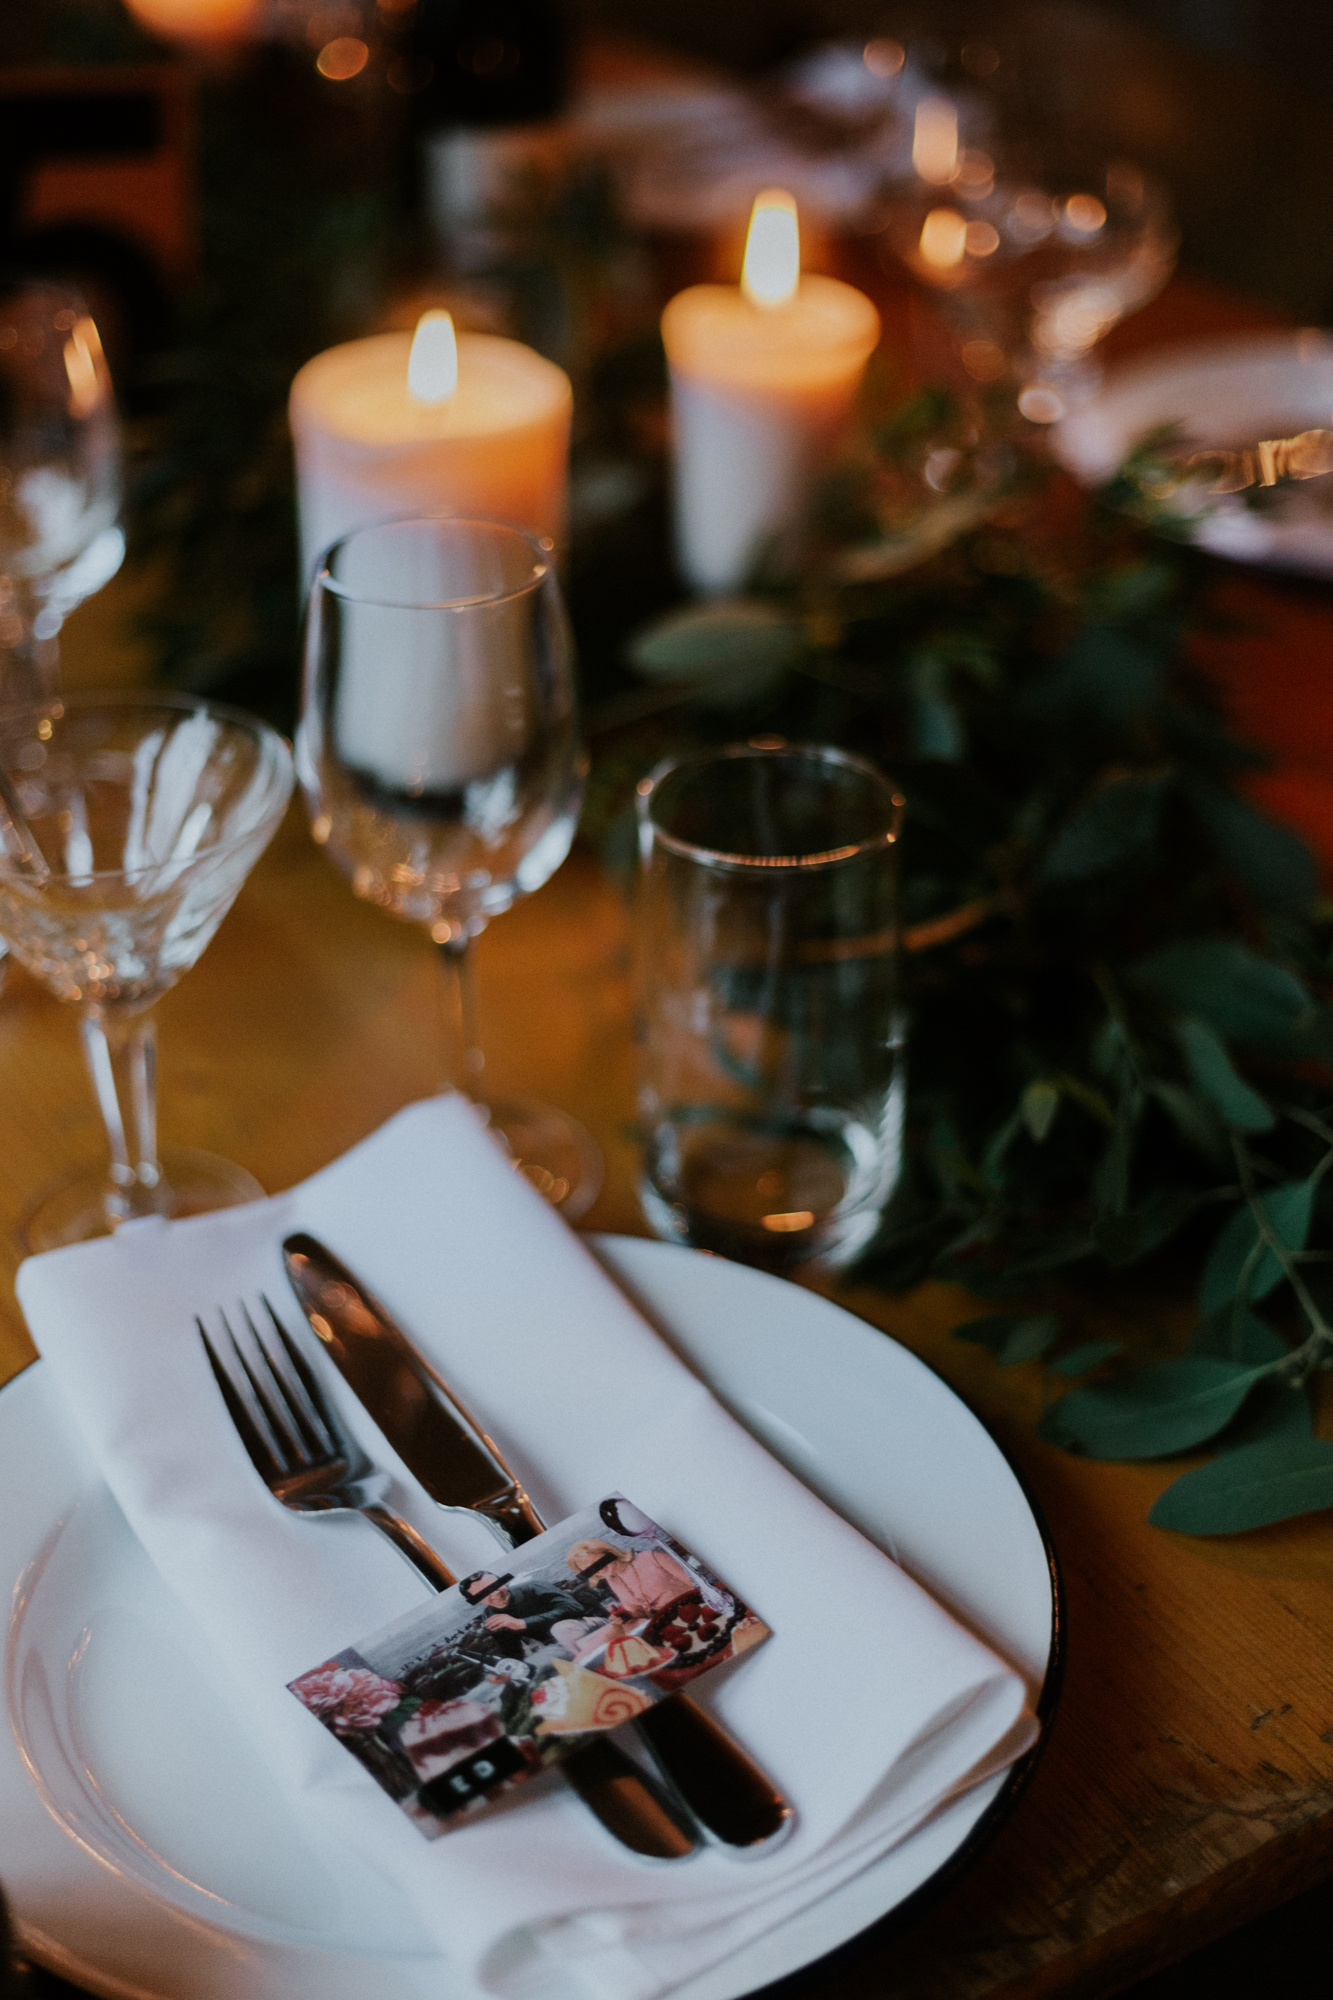 Quirky Venue, Non-traditional wedding planner, London Wedding coordination, Bespoke weddings, Brixton East 1871 Wedding, informal, Dry hire venue, Stylish wedding, Warehouse wedding